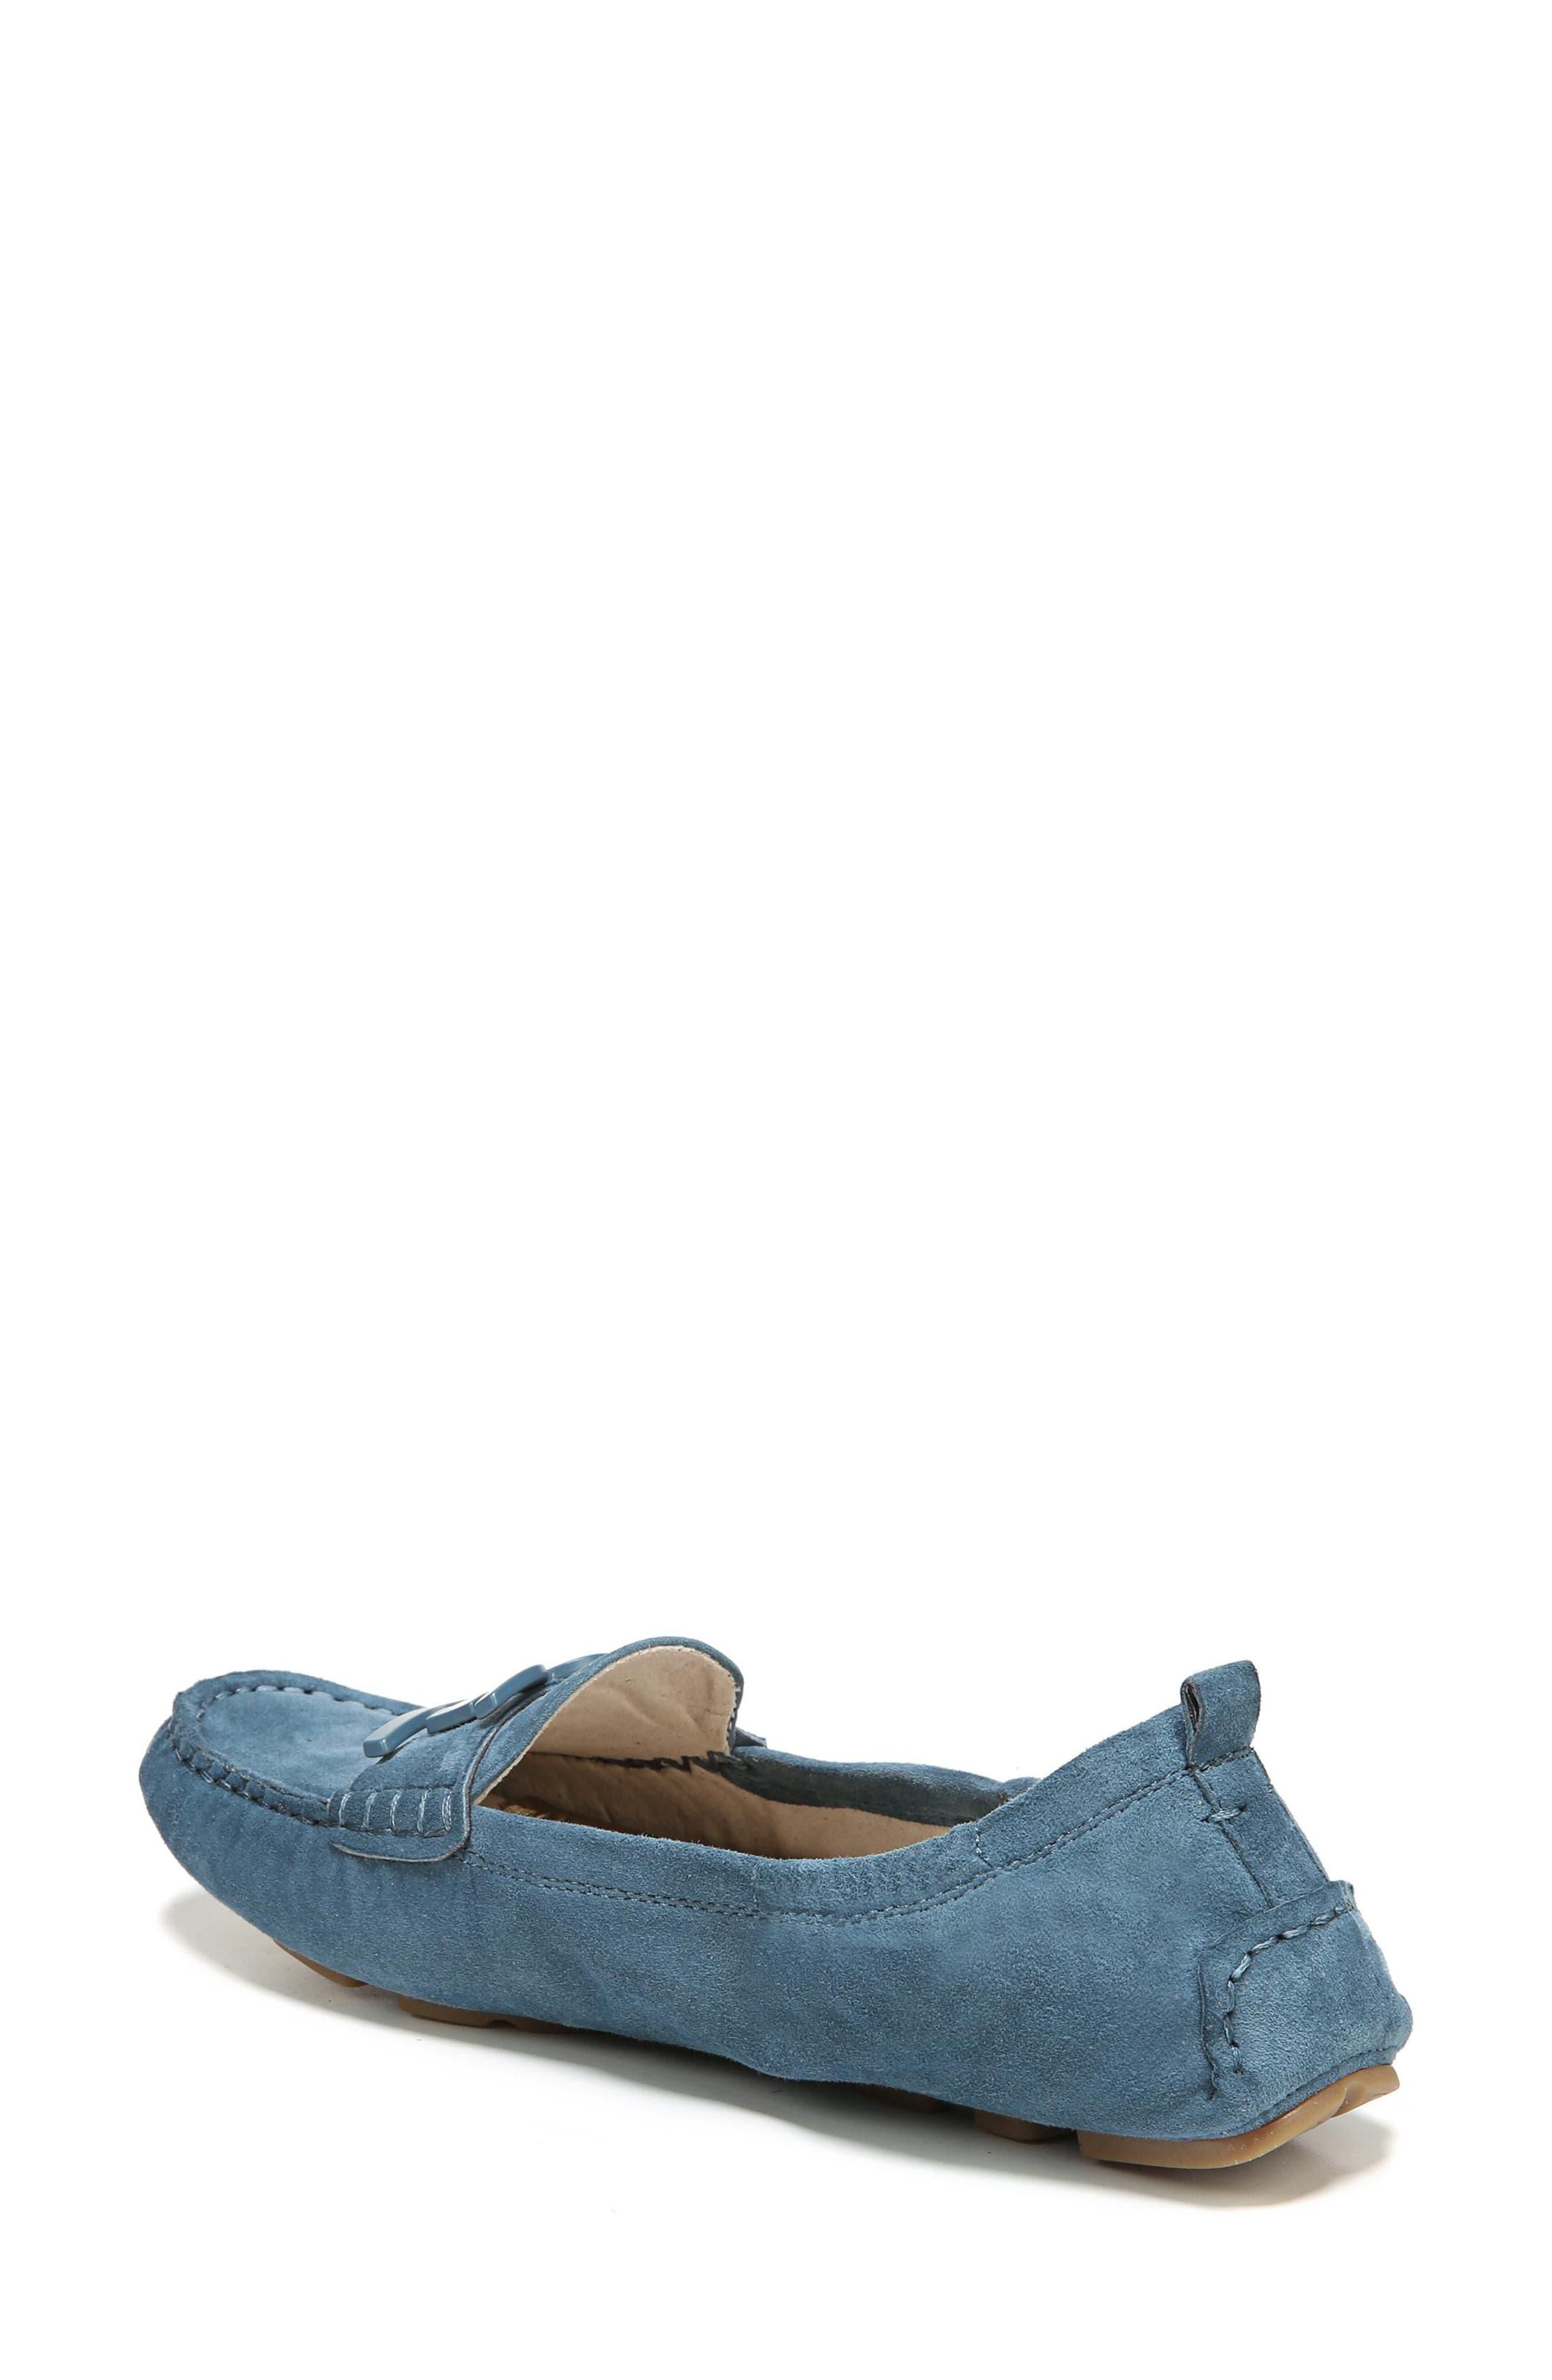 Farrell Moccasin Loafer,                             Alternate thumbnail 2, color,                             Denim Blue Suede